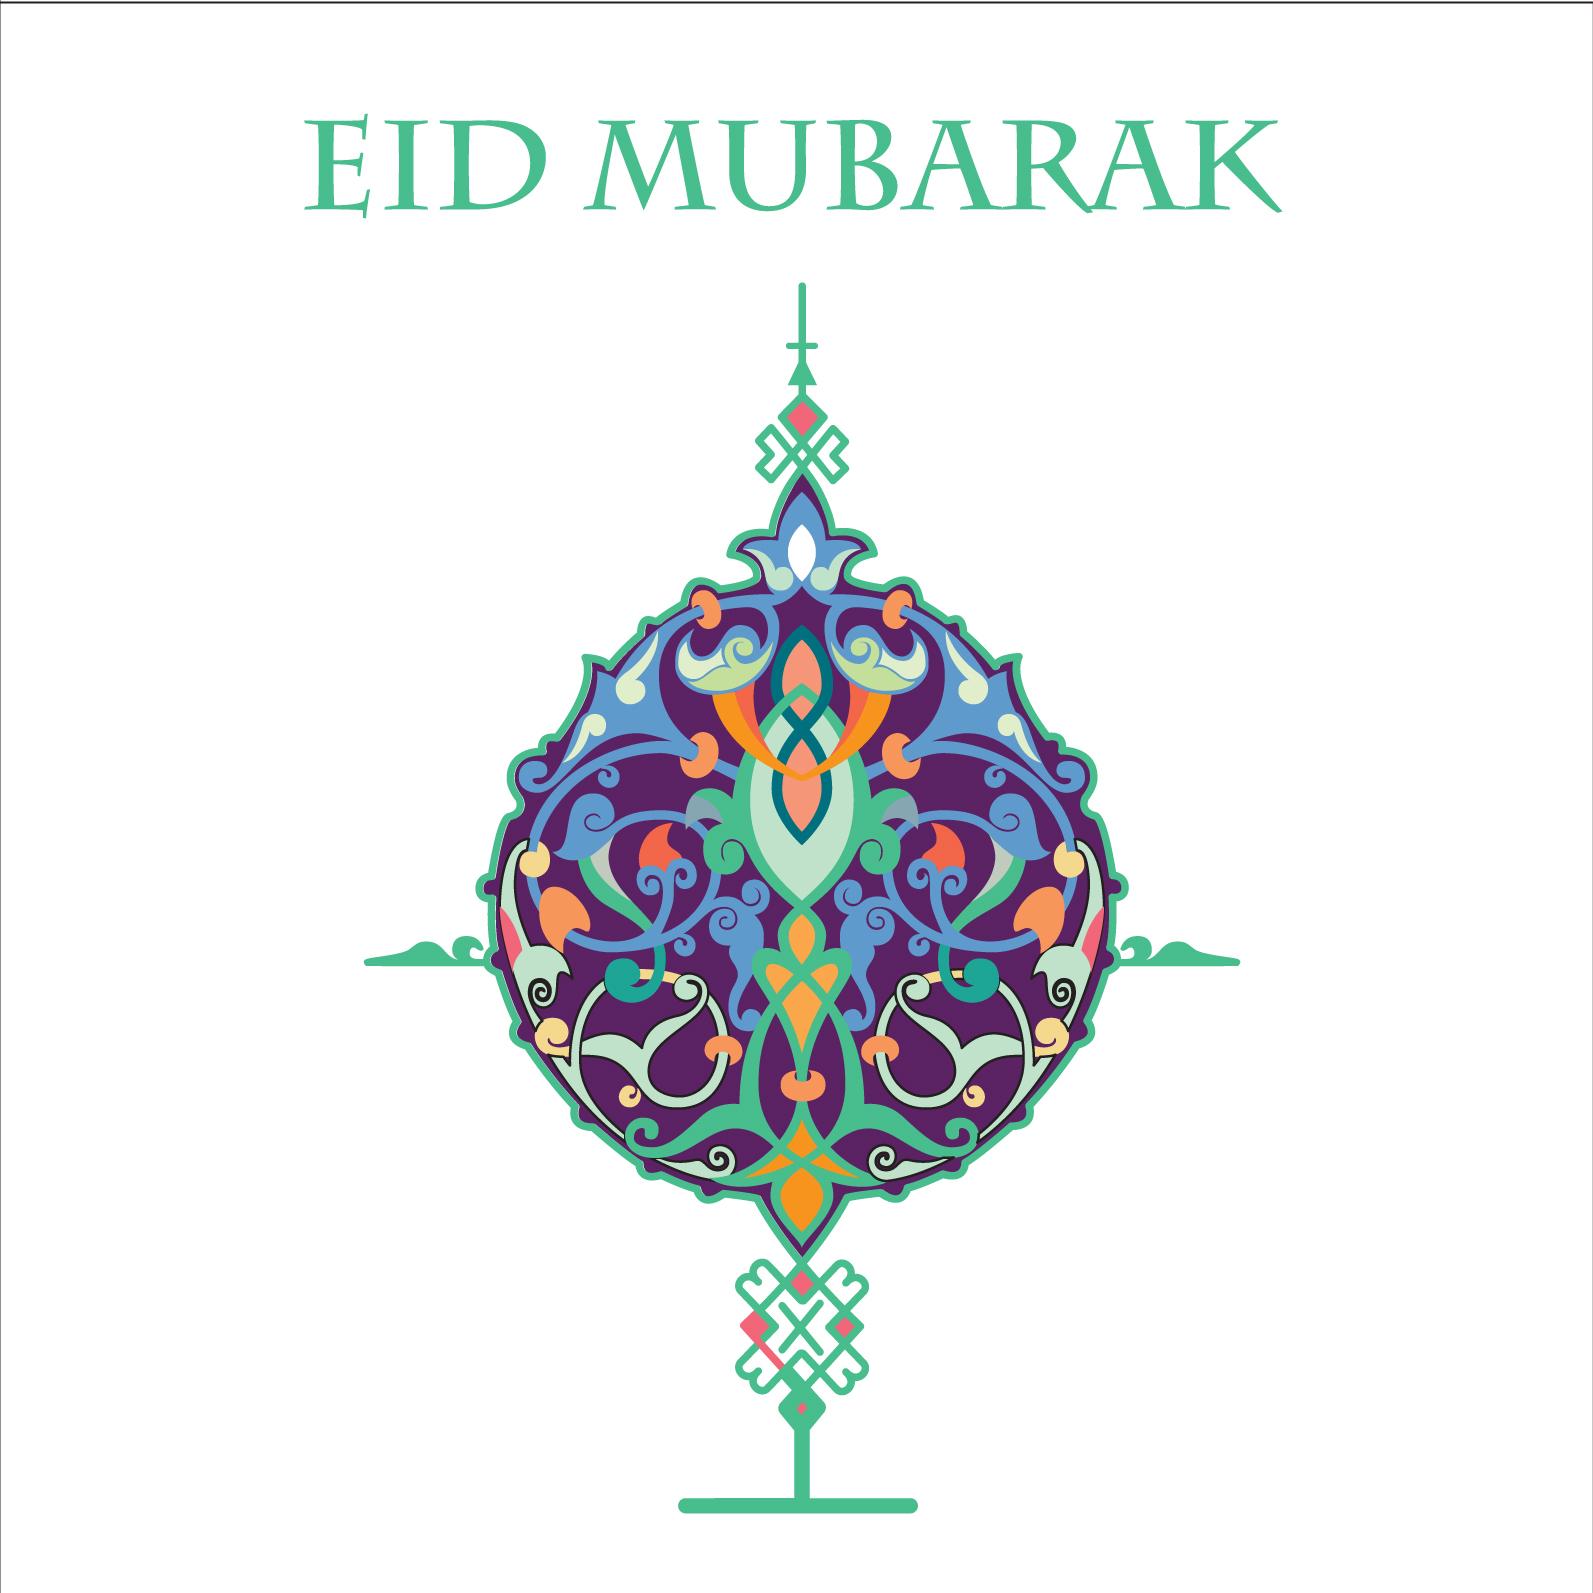 Eid greeting card by Ananya